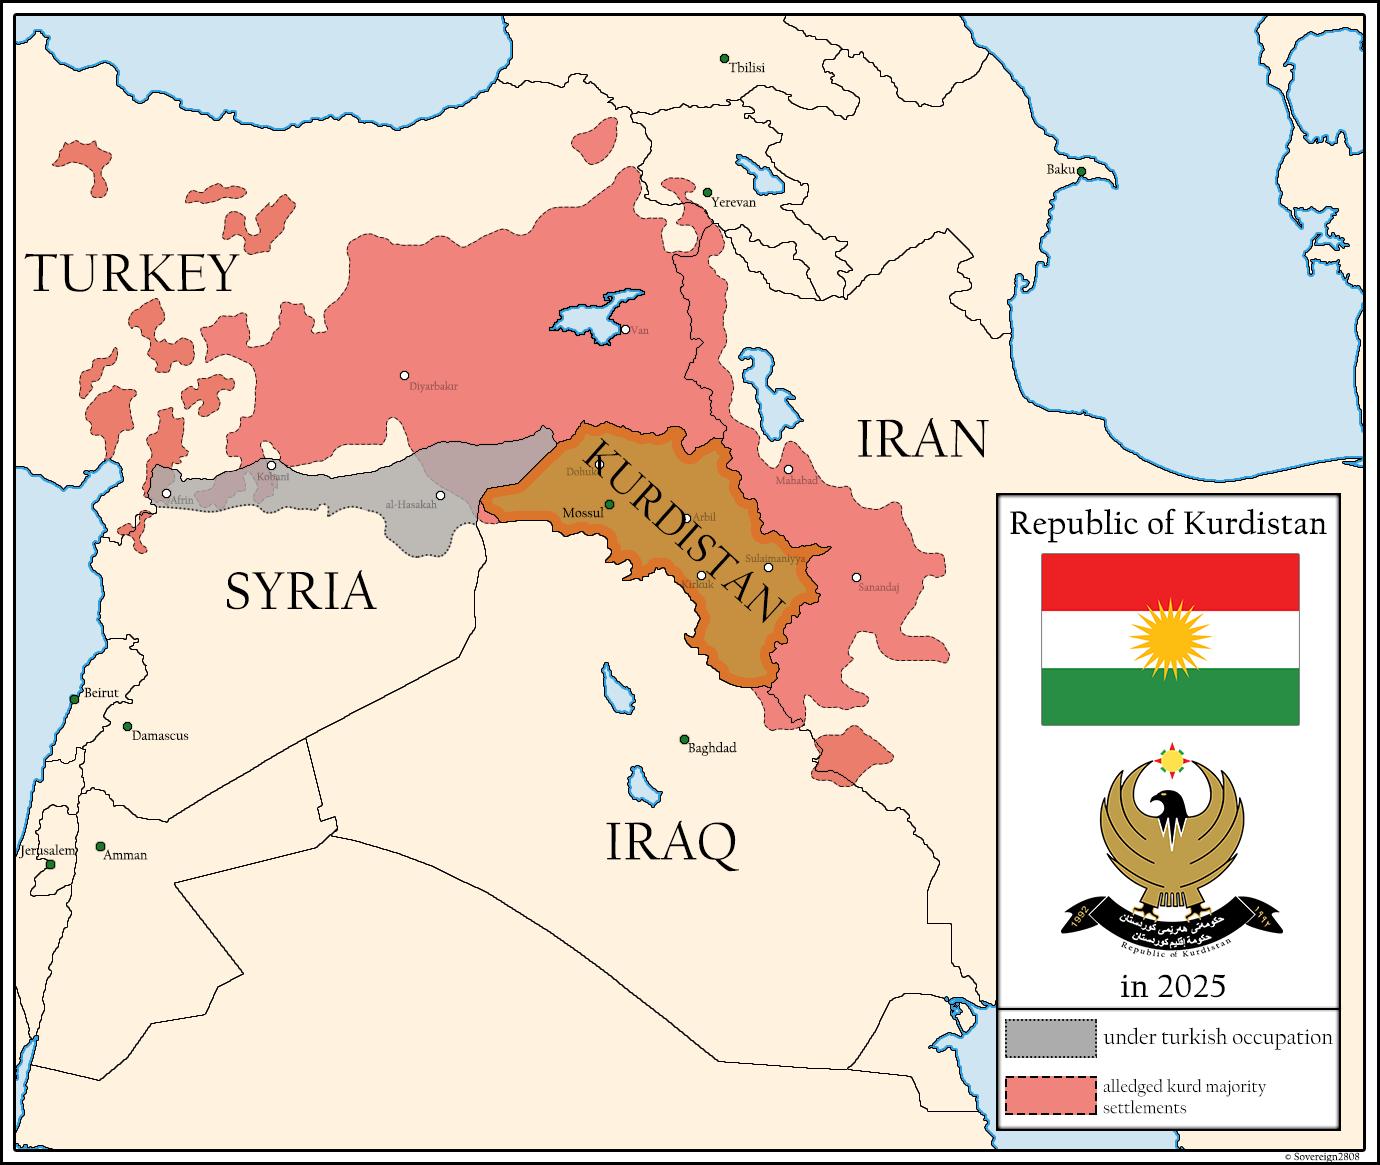 Kurdistan 2025 by Sovereign2808 on DeviantArt